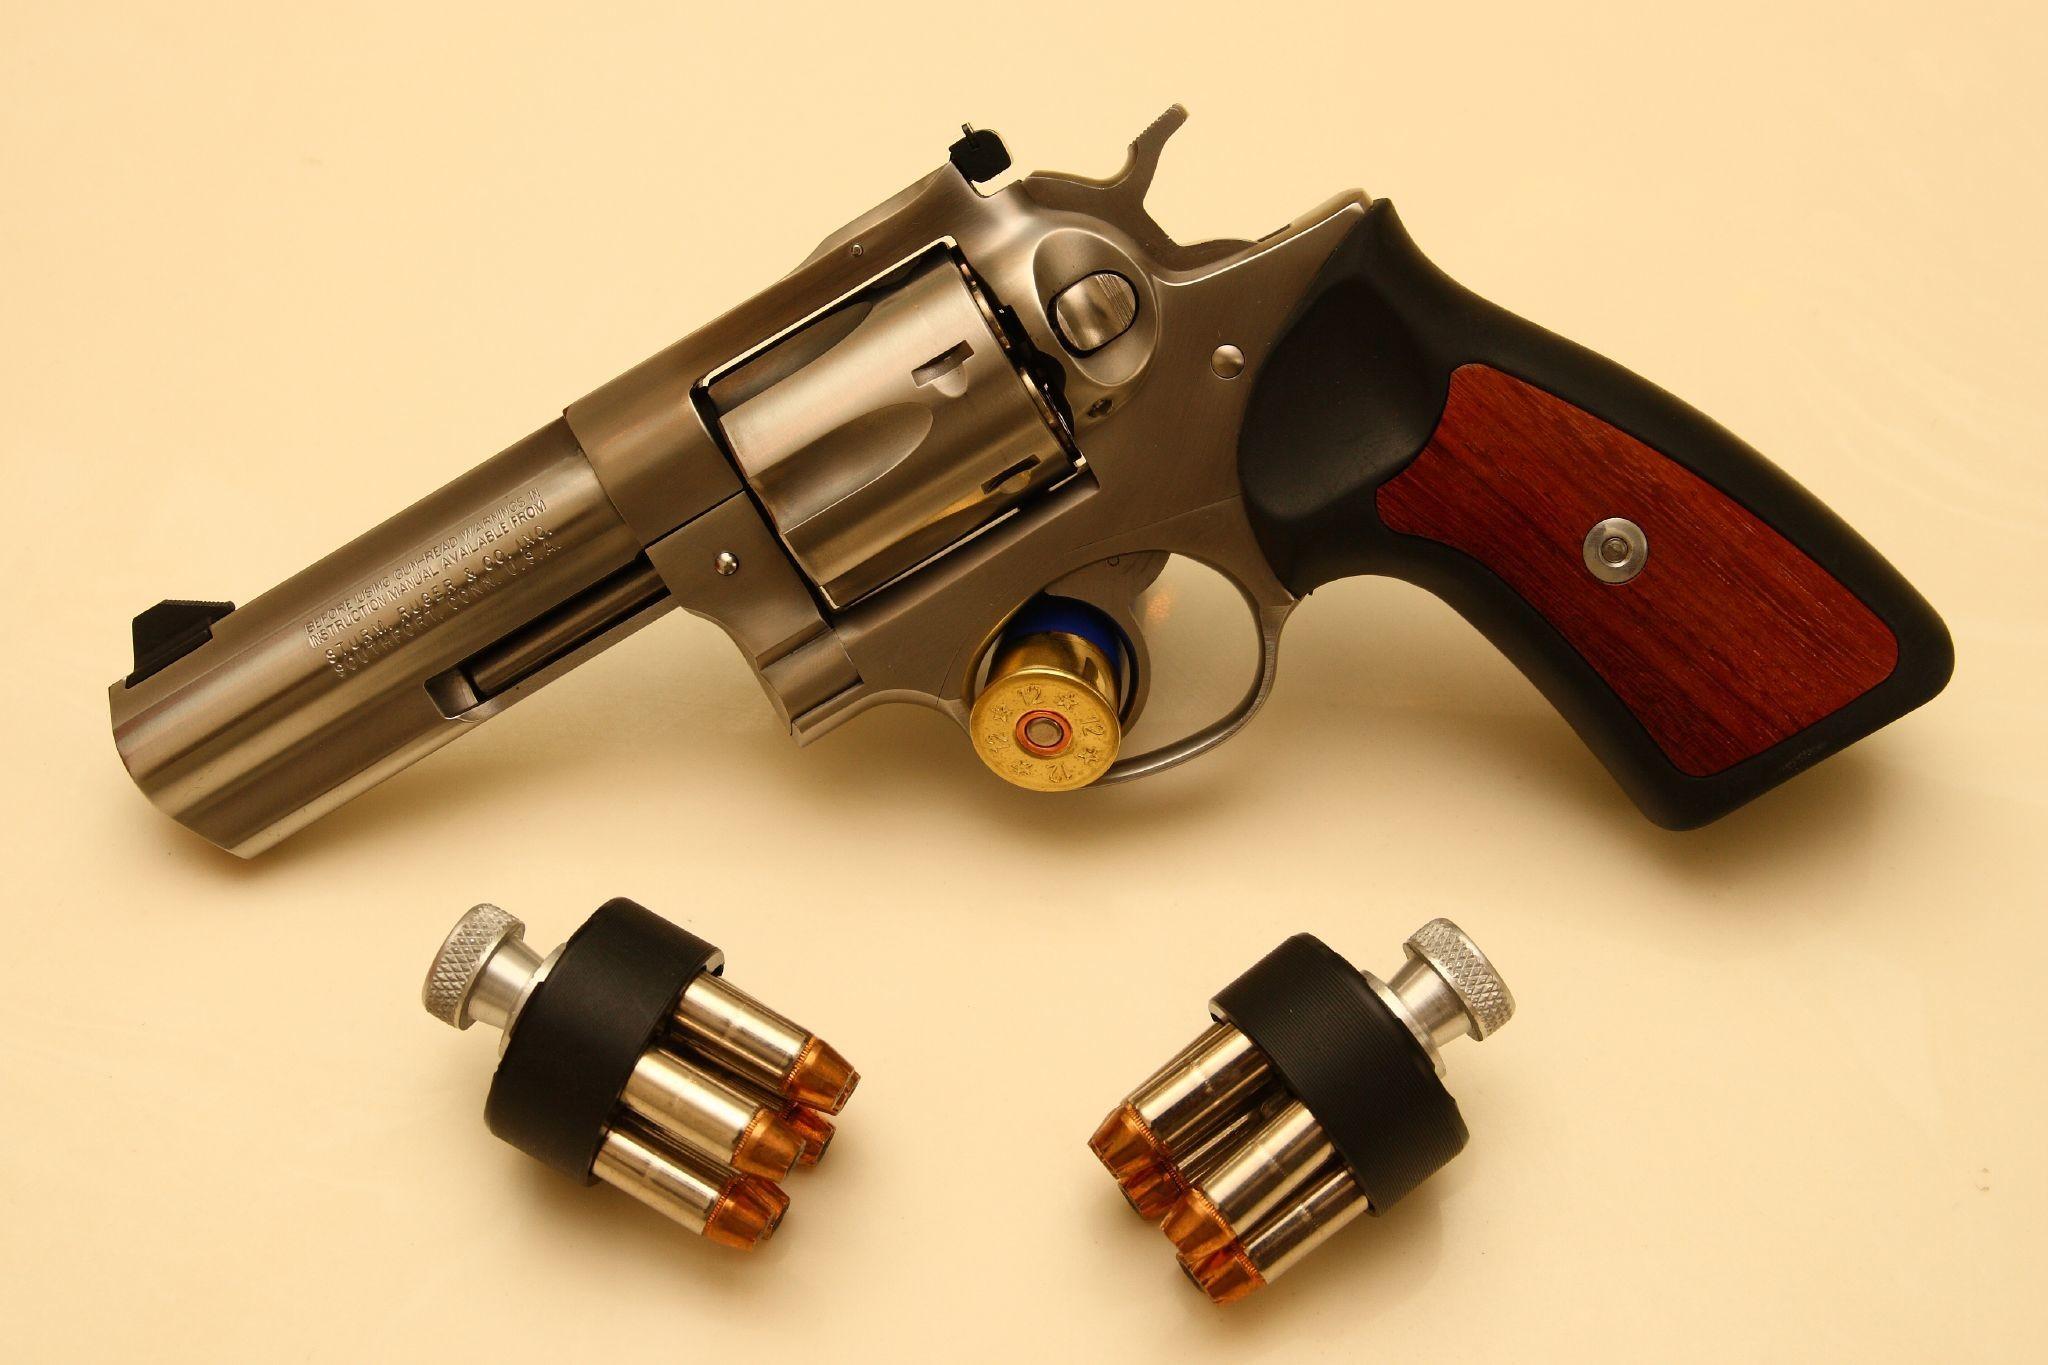 guns revolvers weapons / Wallpaper